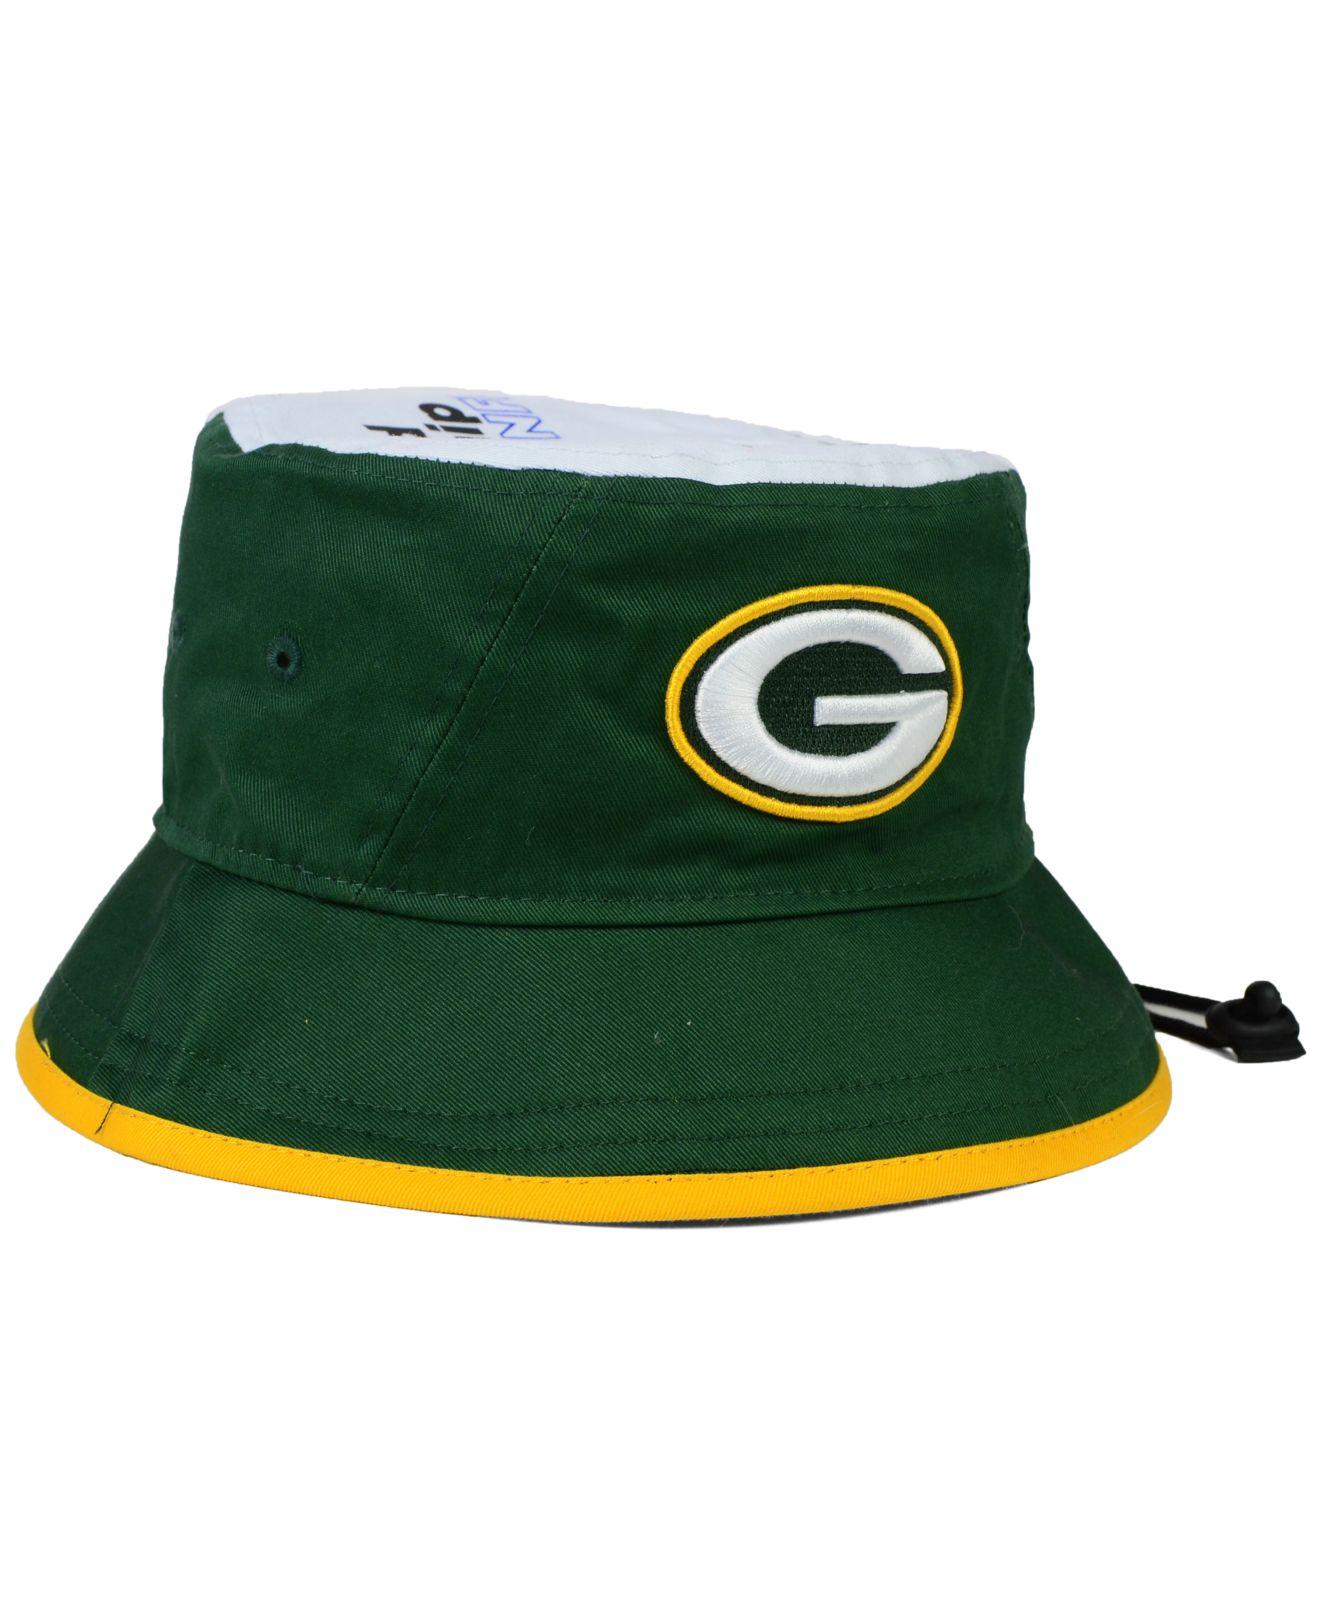 120e2fb70 Lyst - KTZ Green Bay Packers Traveler Bucket Hat in Green for Men